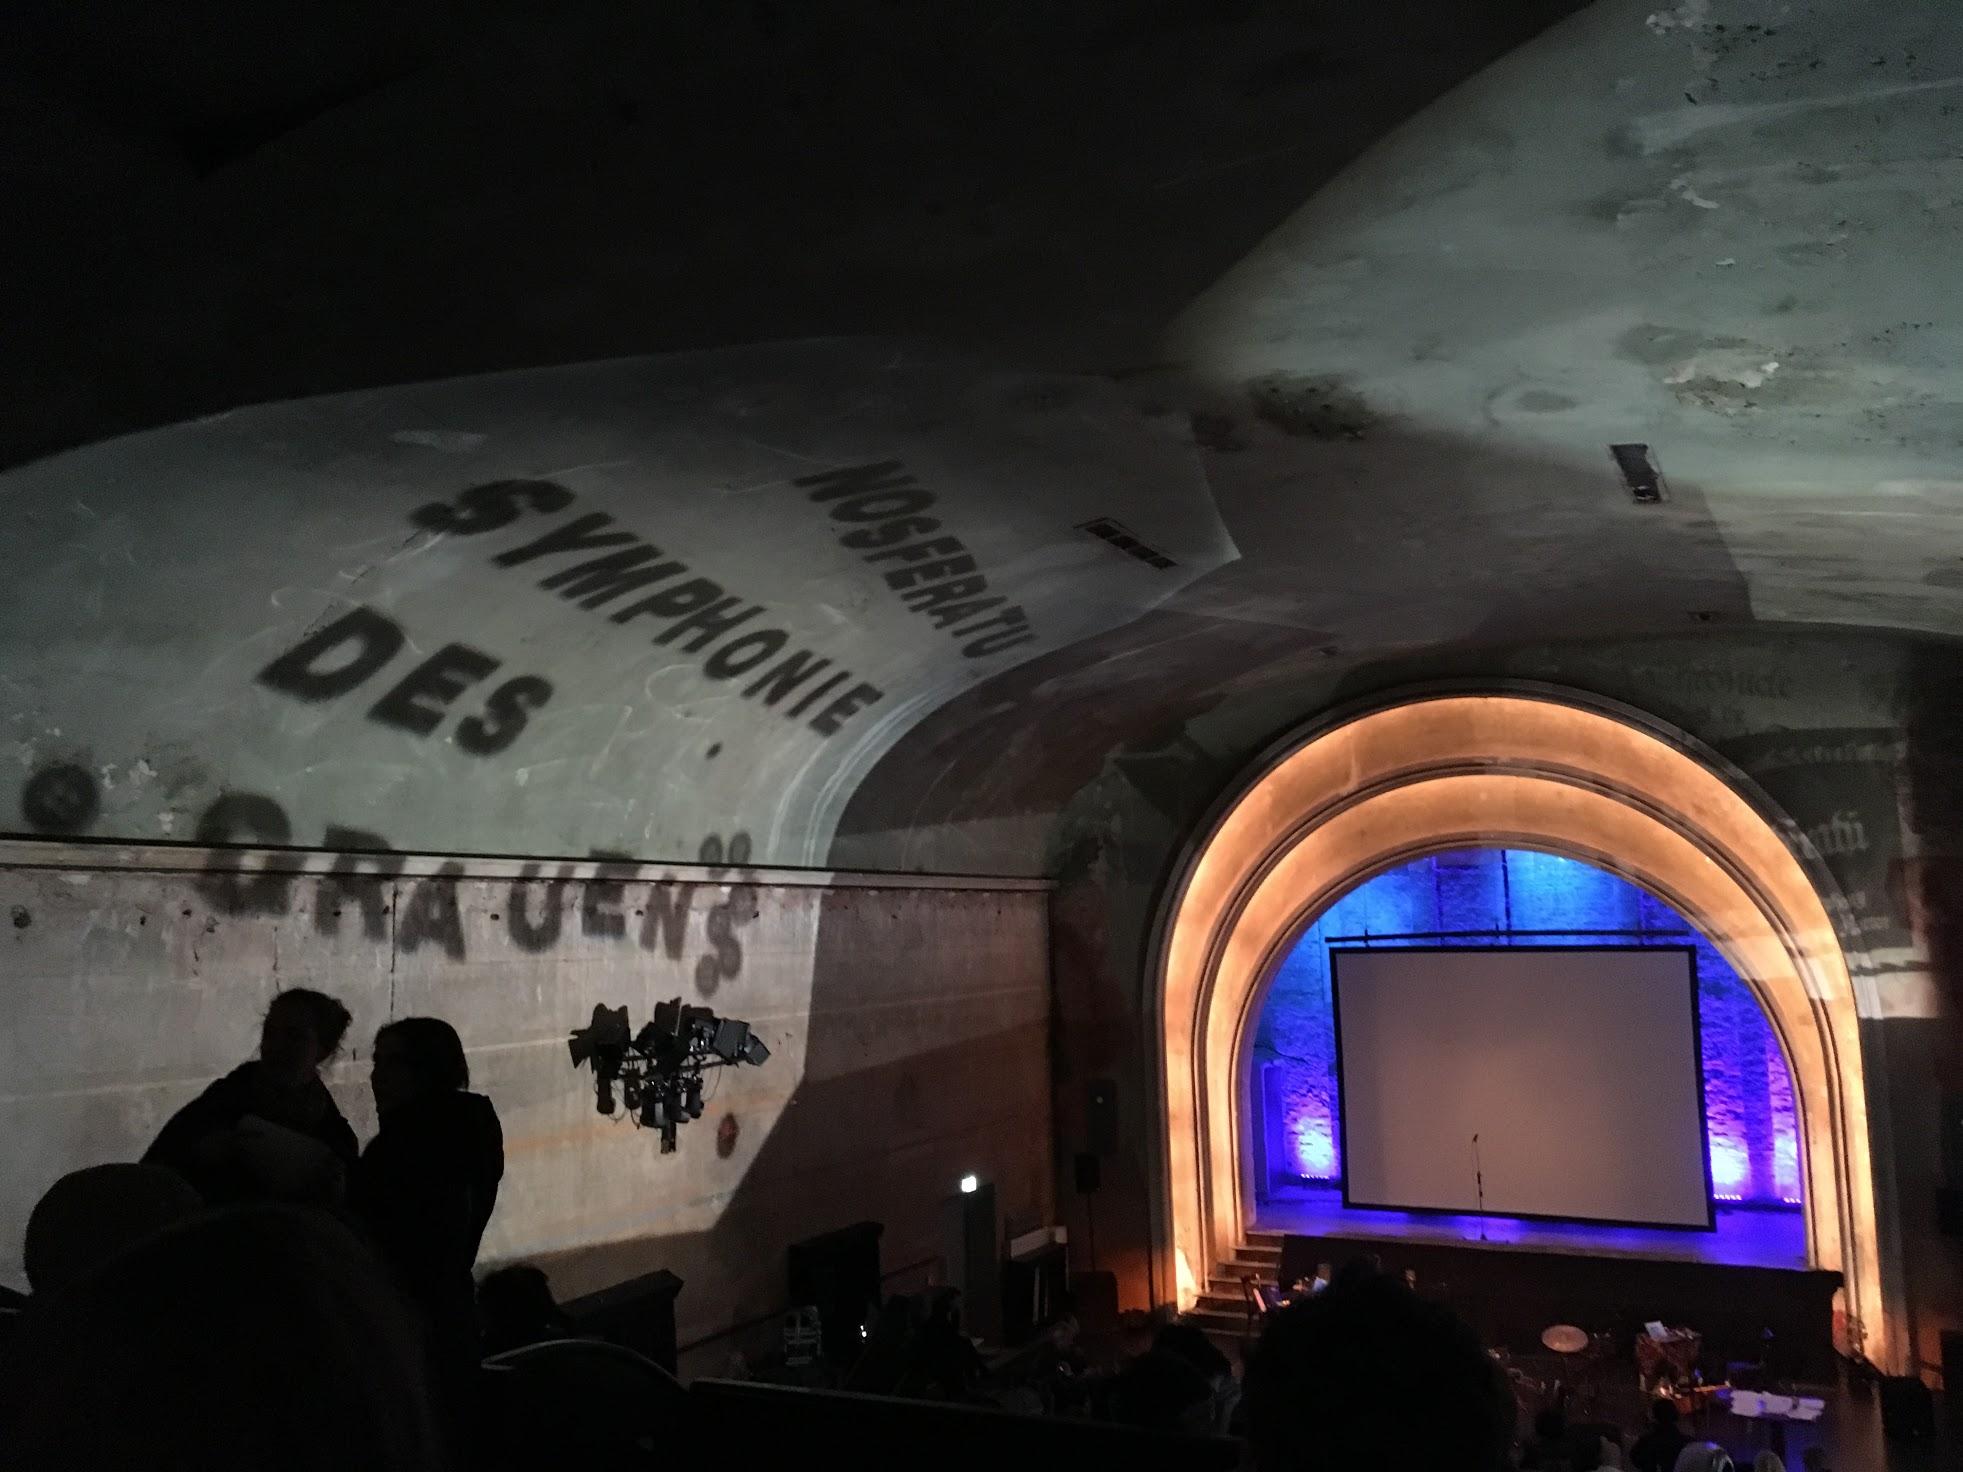 Nosferatu  with live musical accompaniment and projections, Delphi Stummfilmkino, February 2018